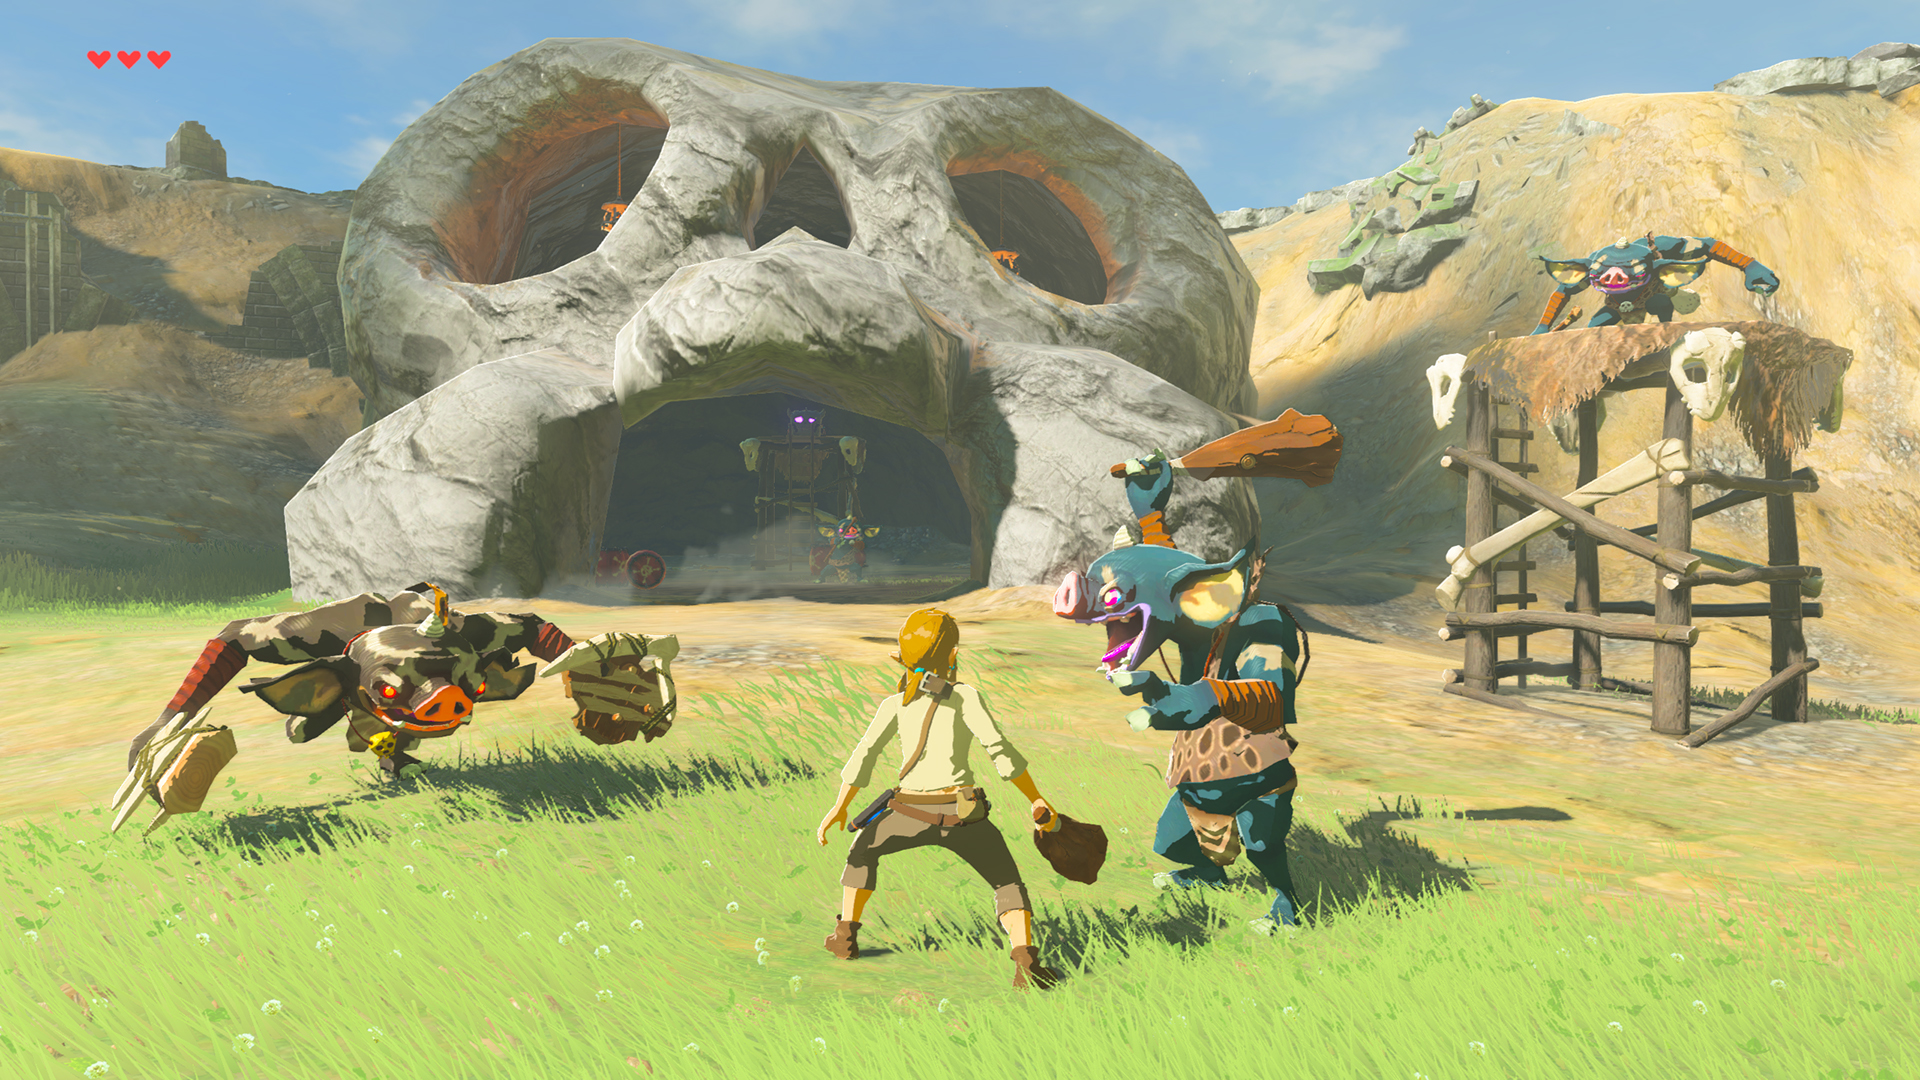 The Legend of Zelda Breath of the Wild Hard Mode Screen 1